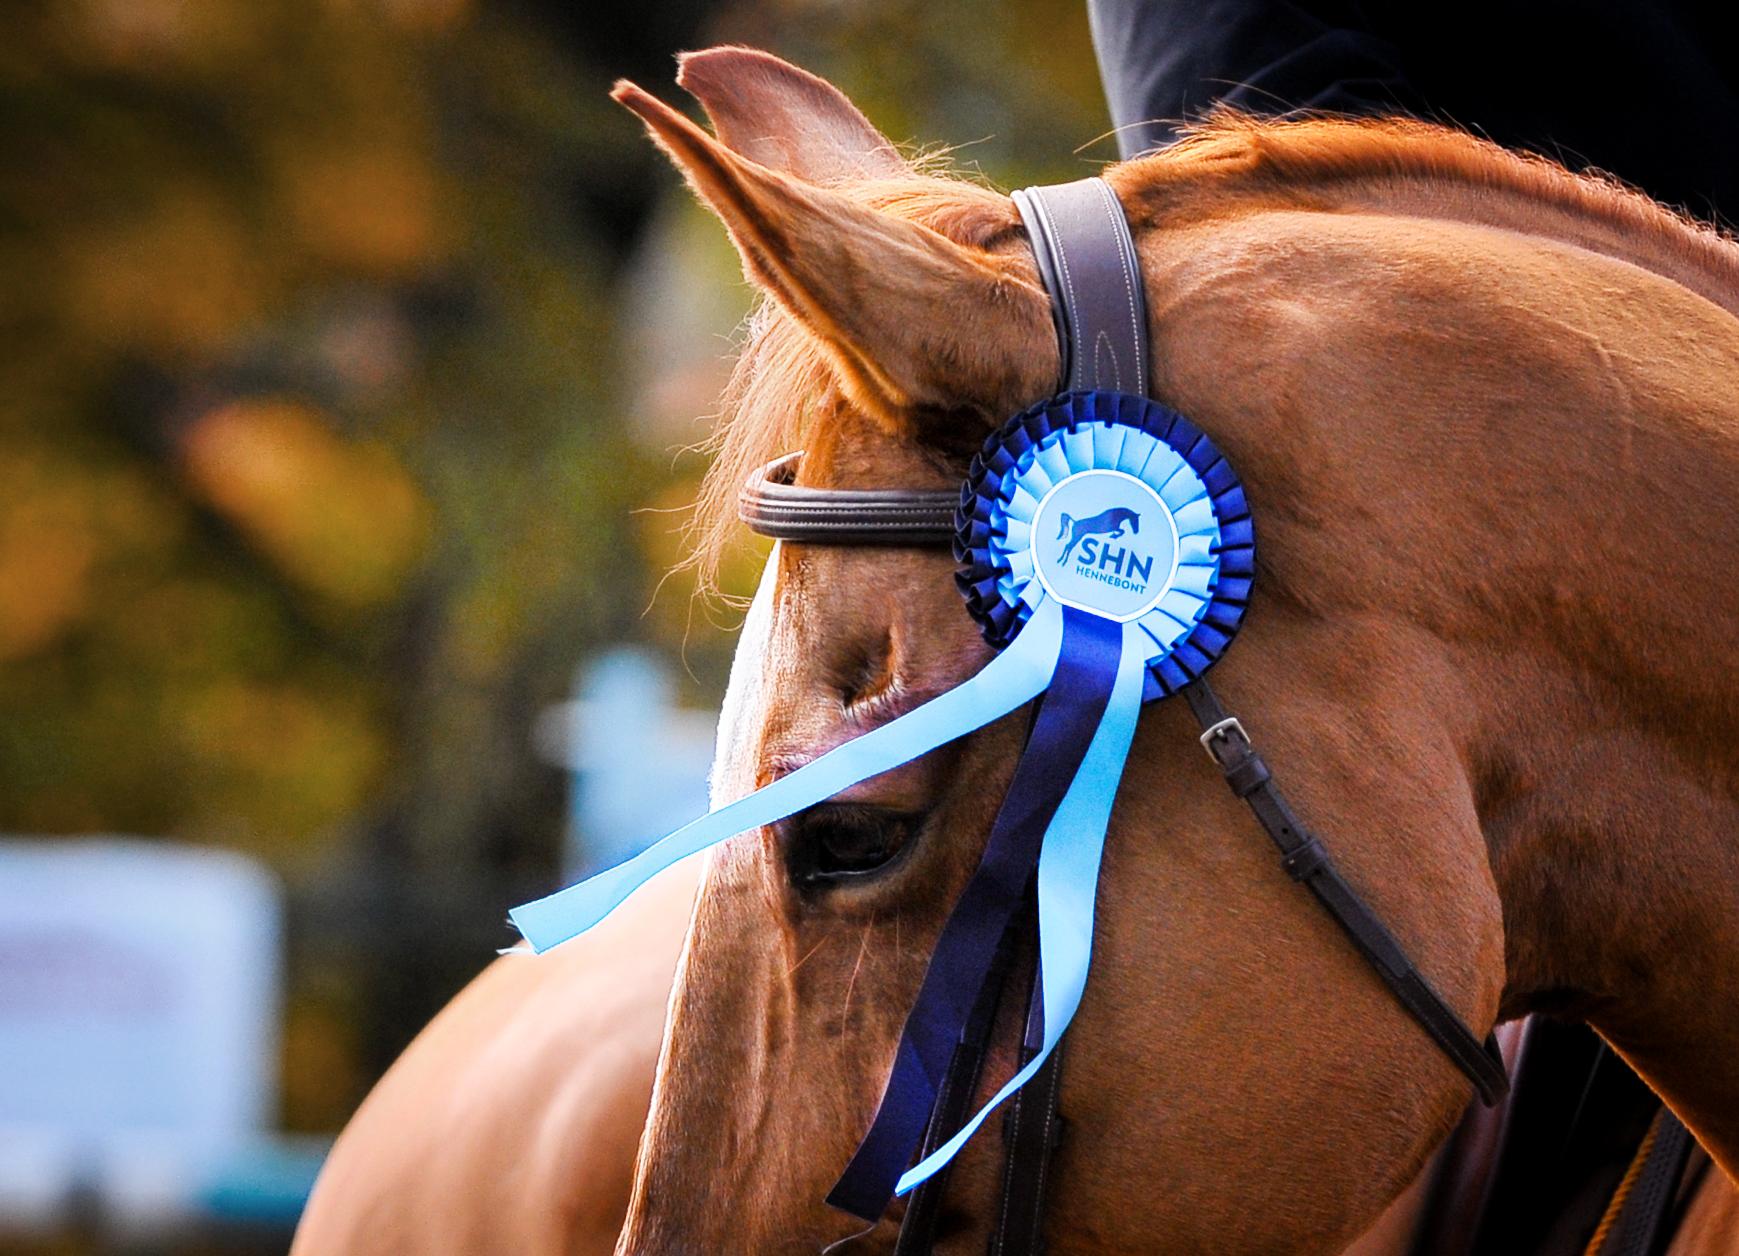 loisir equestre Morbihan ; loisirs Bretagne sud ; Groix